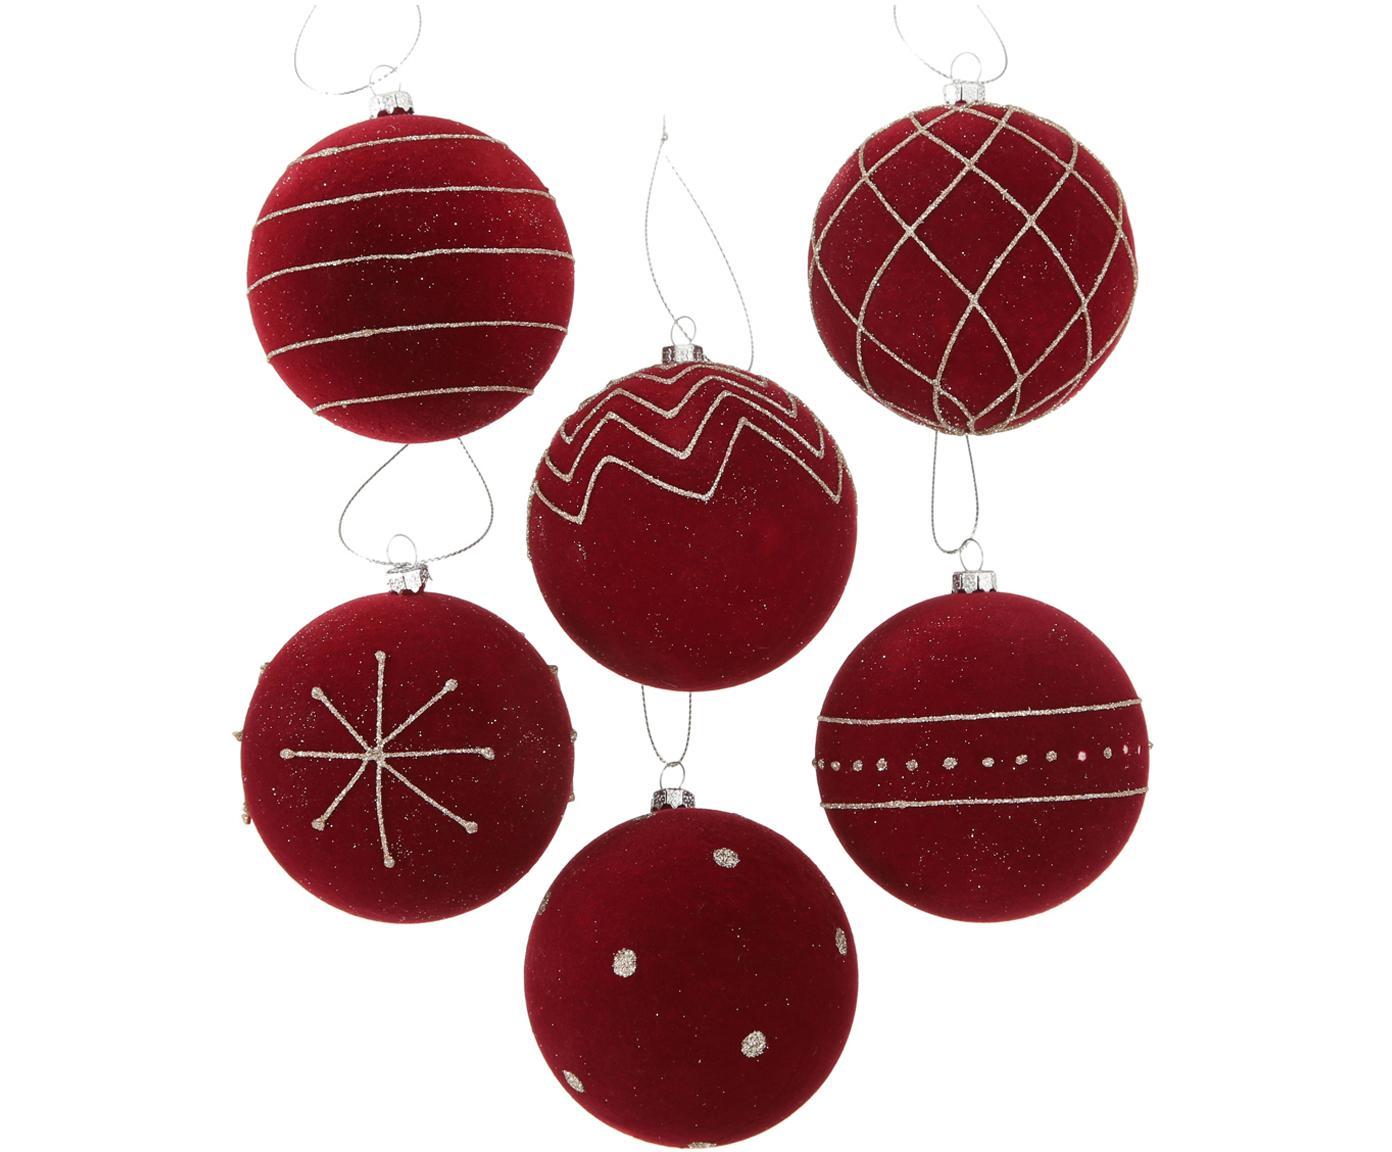 Weihnachtskugel-Set Melitia, 6-tlg., Rot, Silberfarben, Ø 8 x H 8 cm